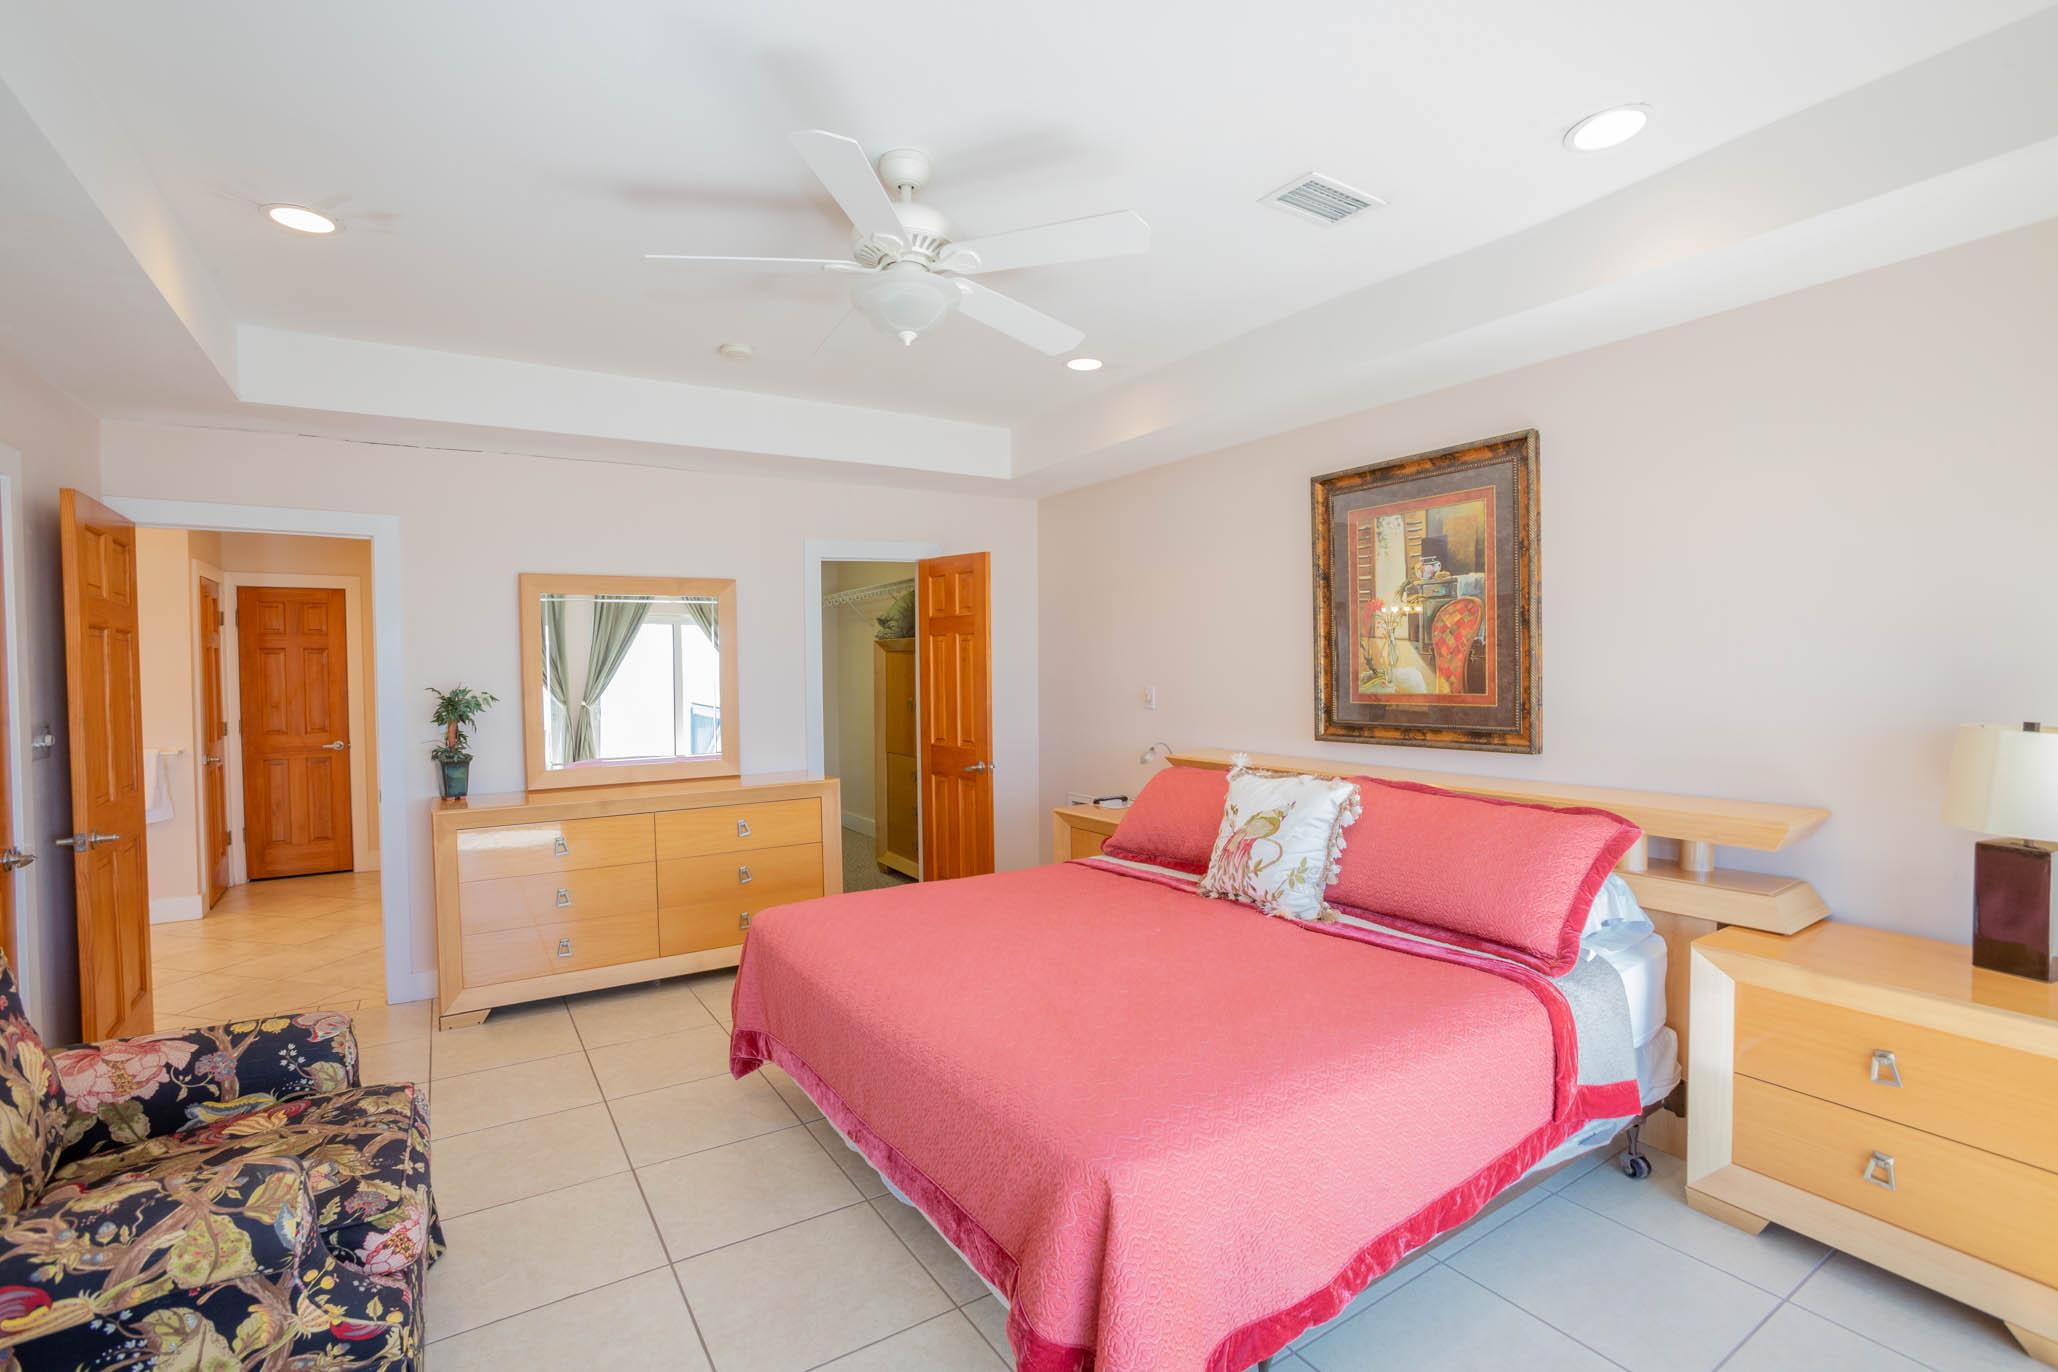 Ariola 1214 House/Cottage rental in Luxury Homes in Pensacola Beach Florida - #45